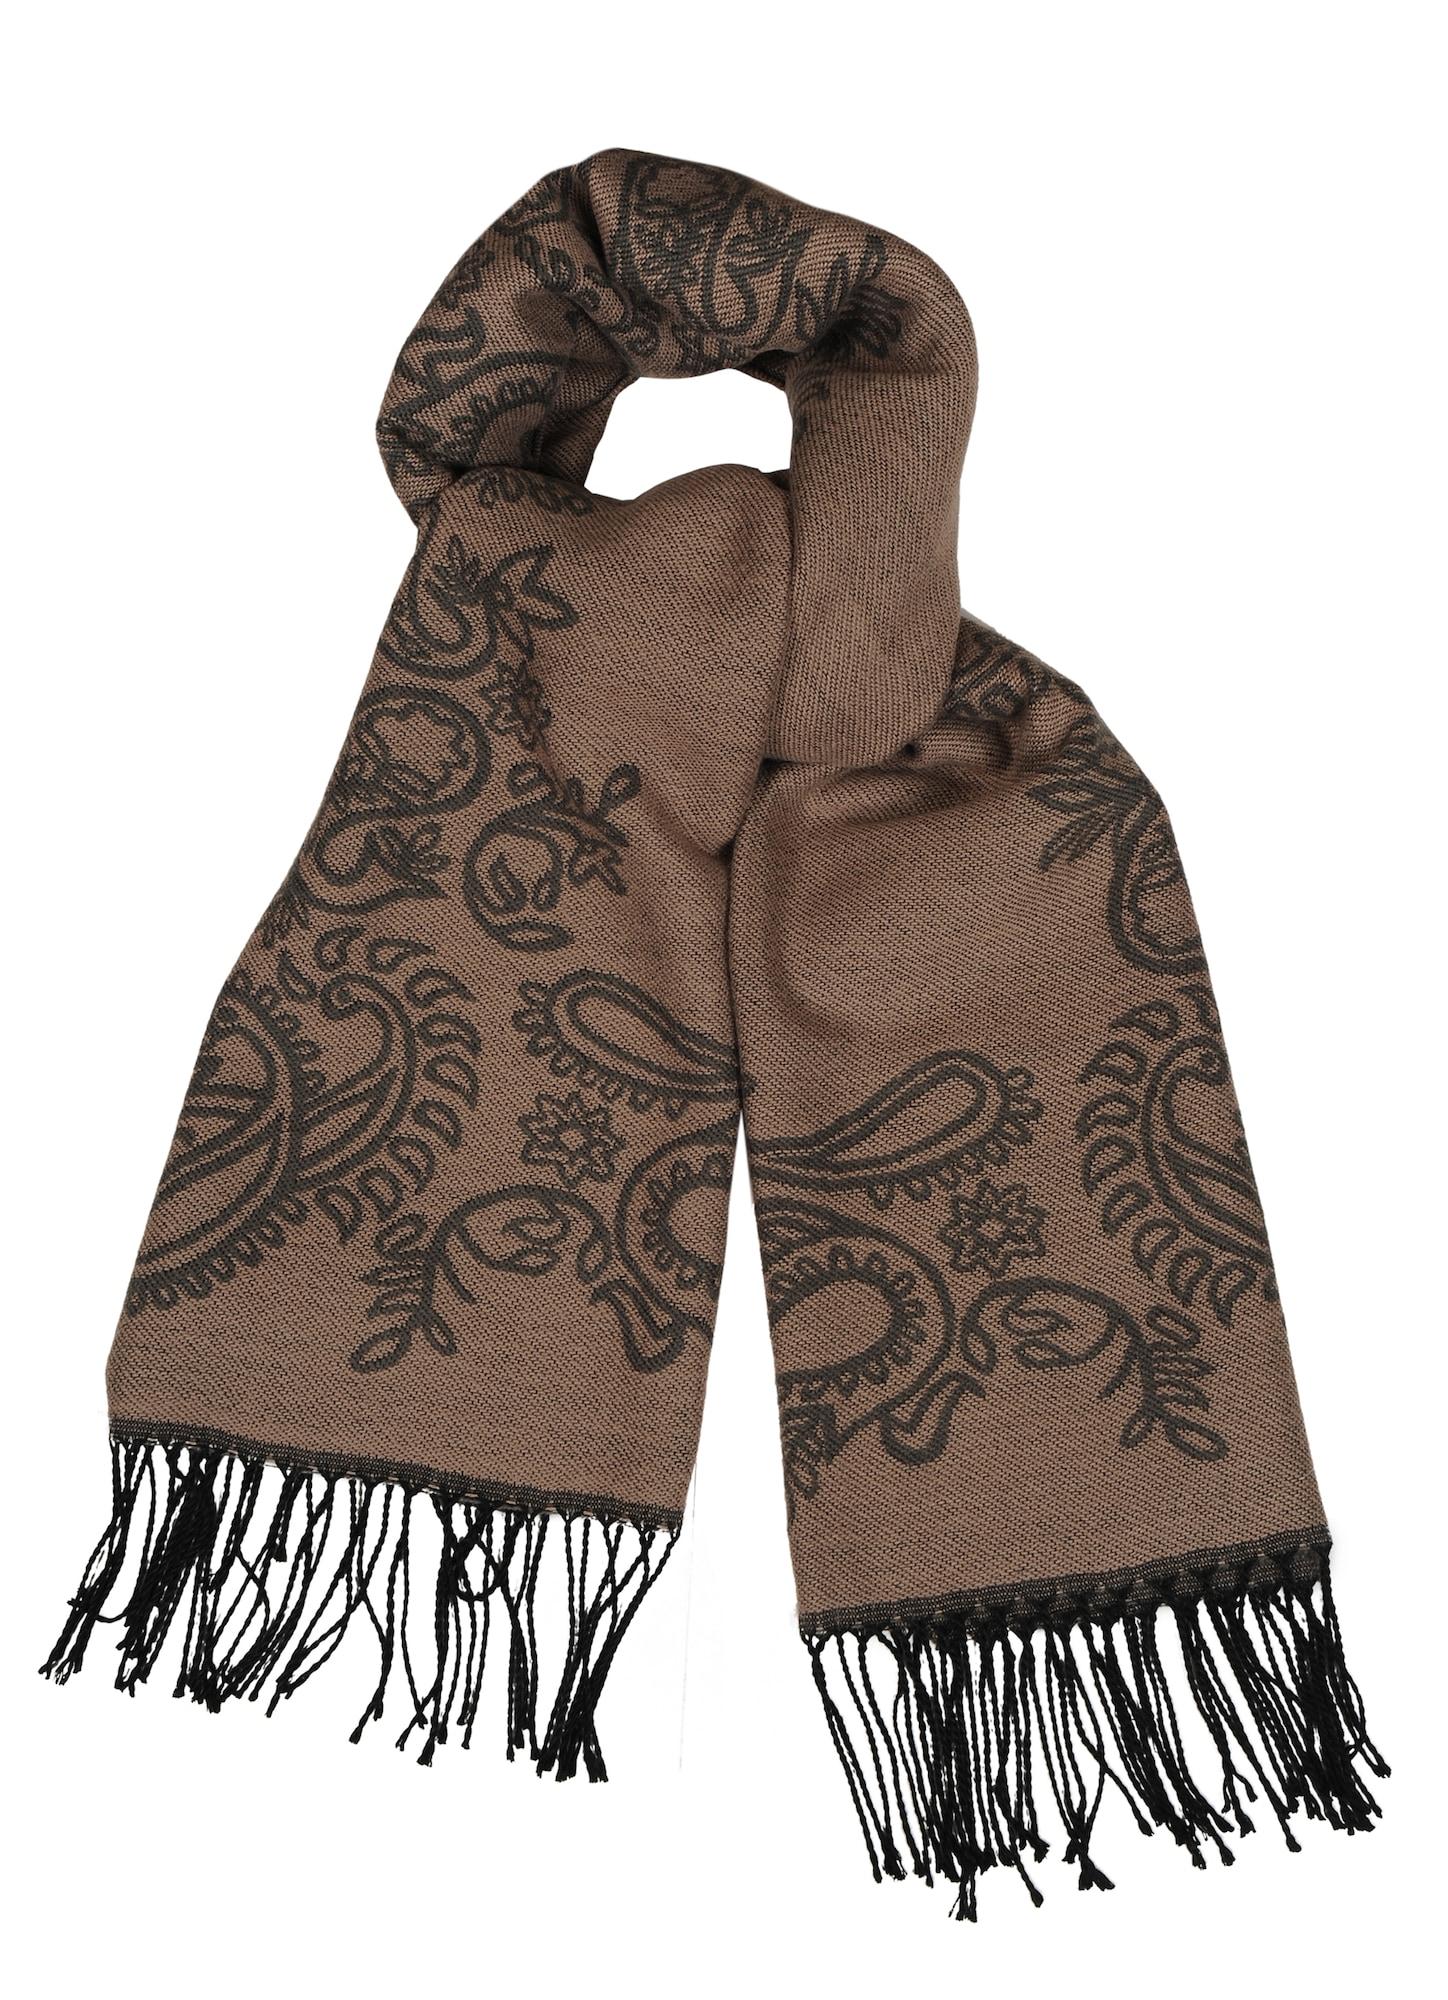 Schal | Accessoires > Schals & Tücher > Schals | Silvio Tossi